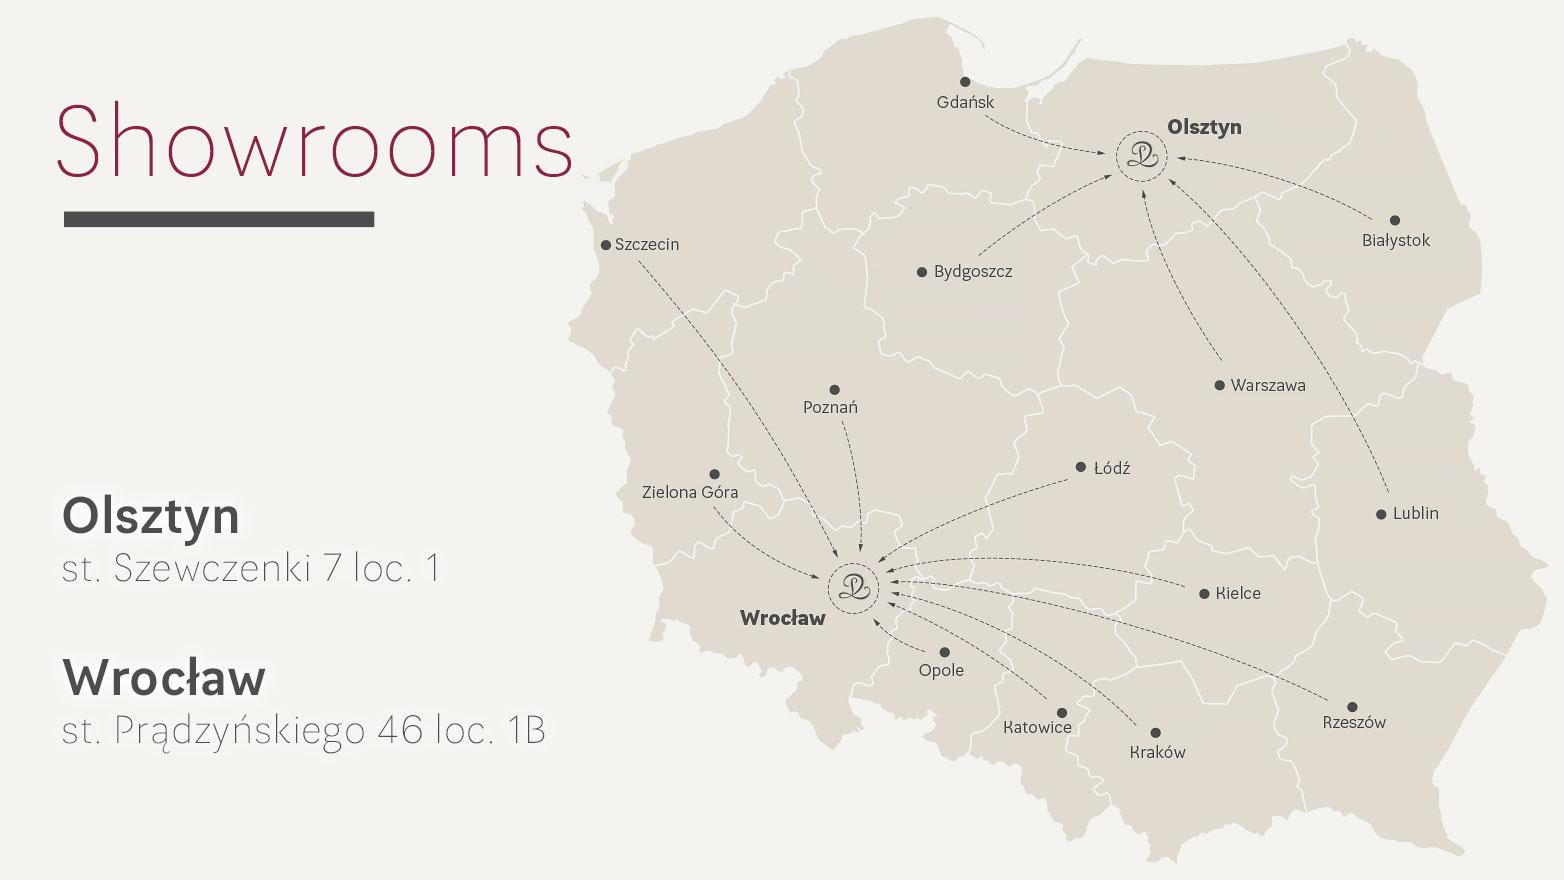 showrooms mapa eng